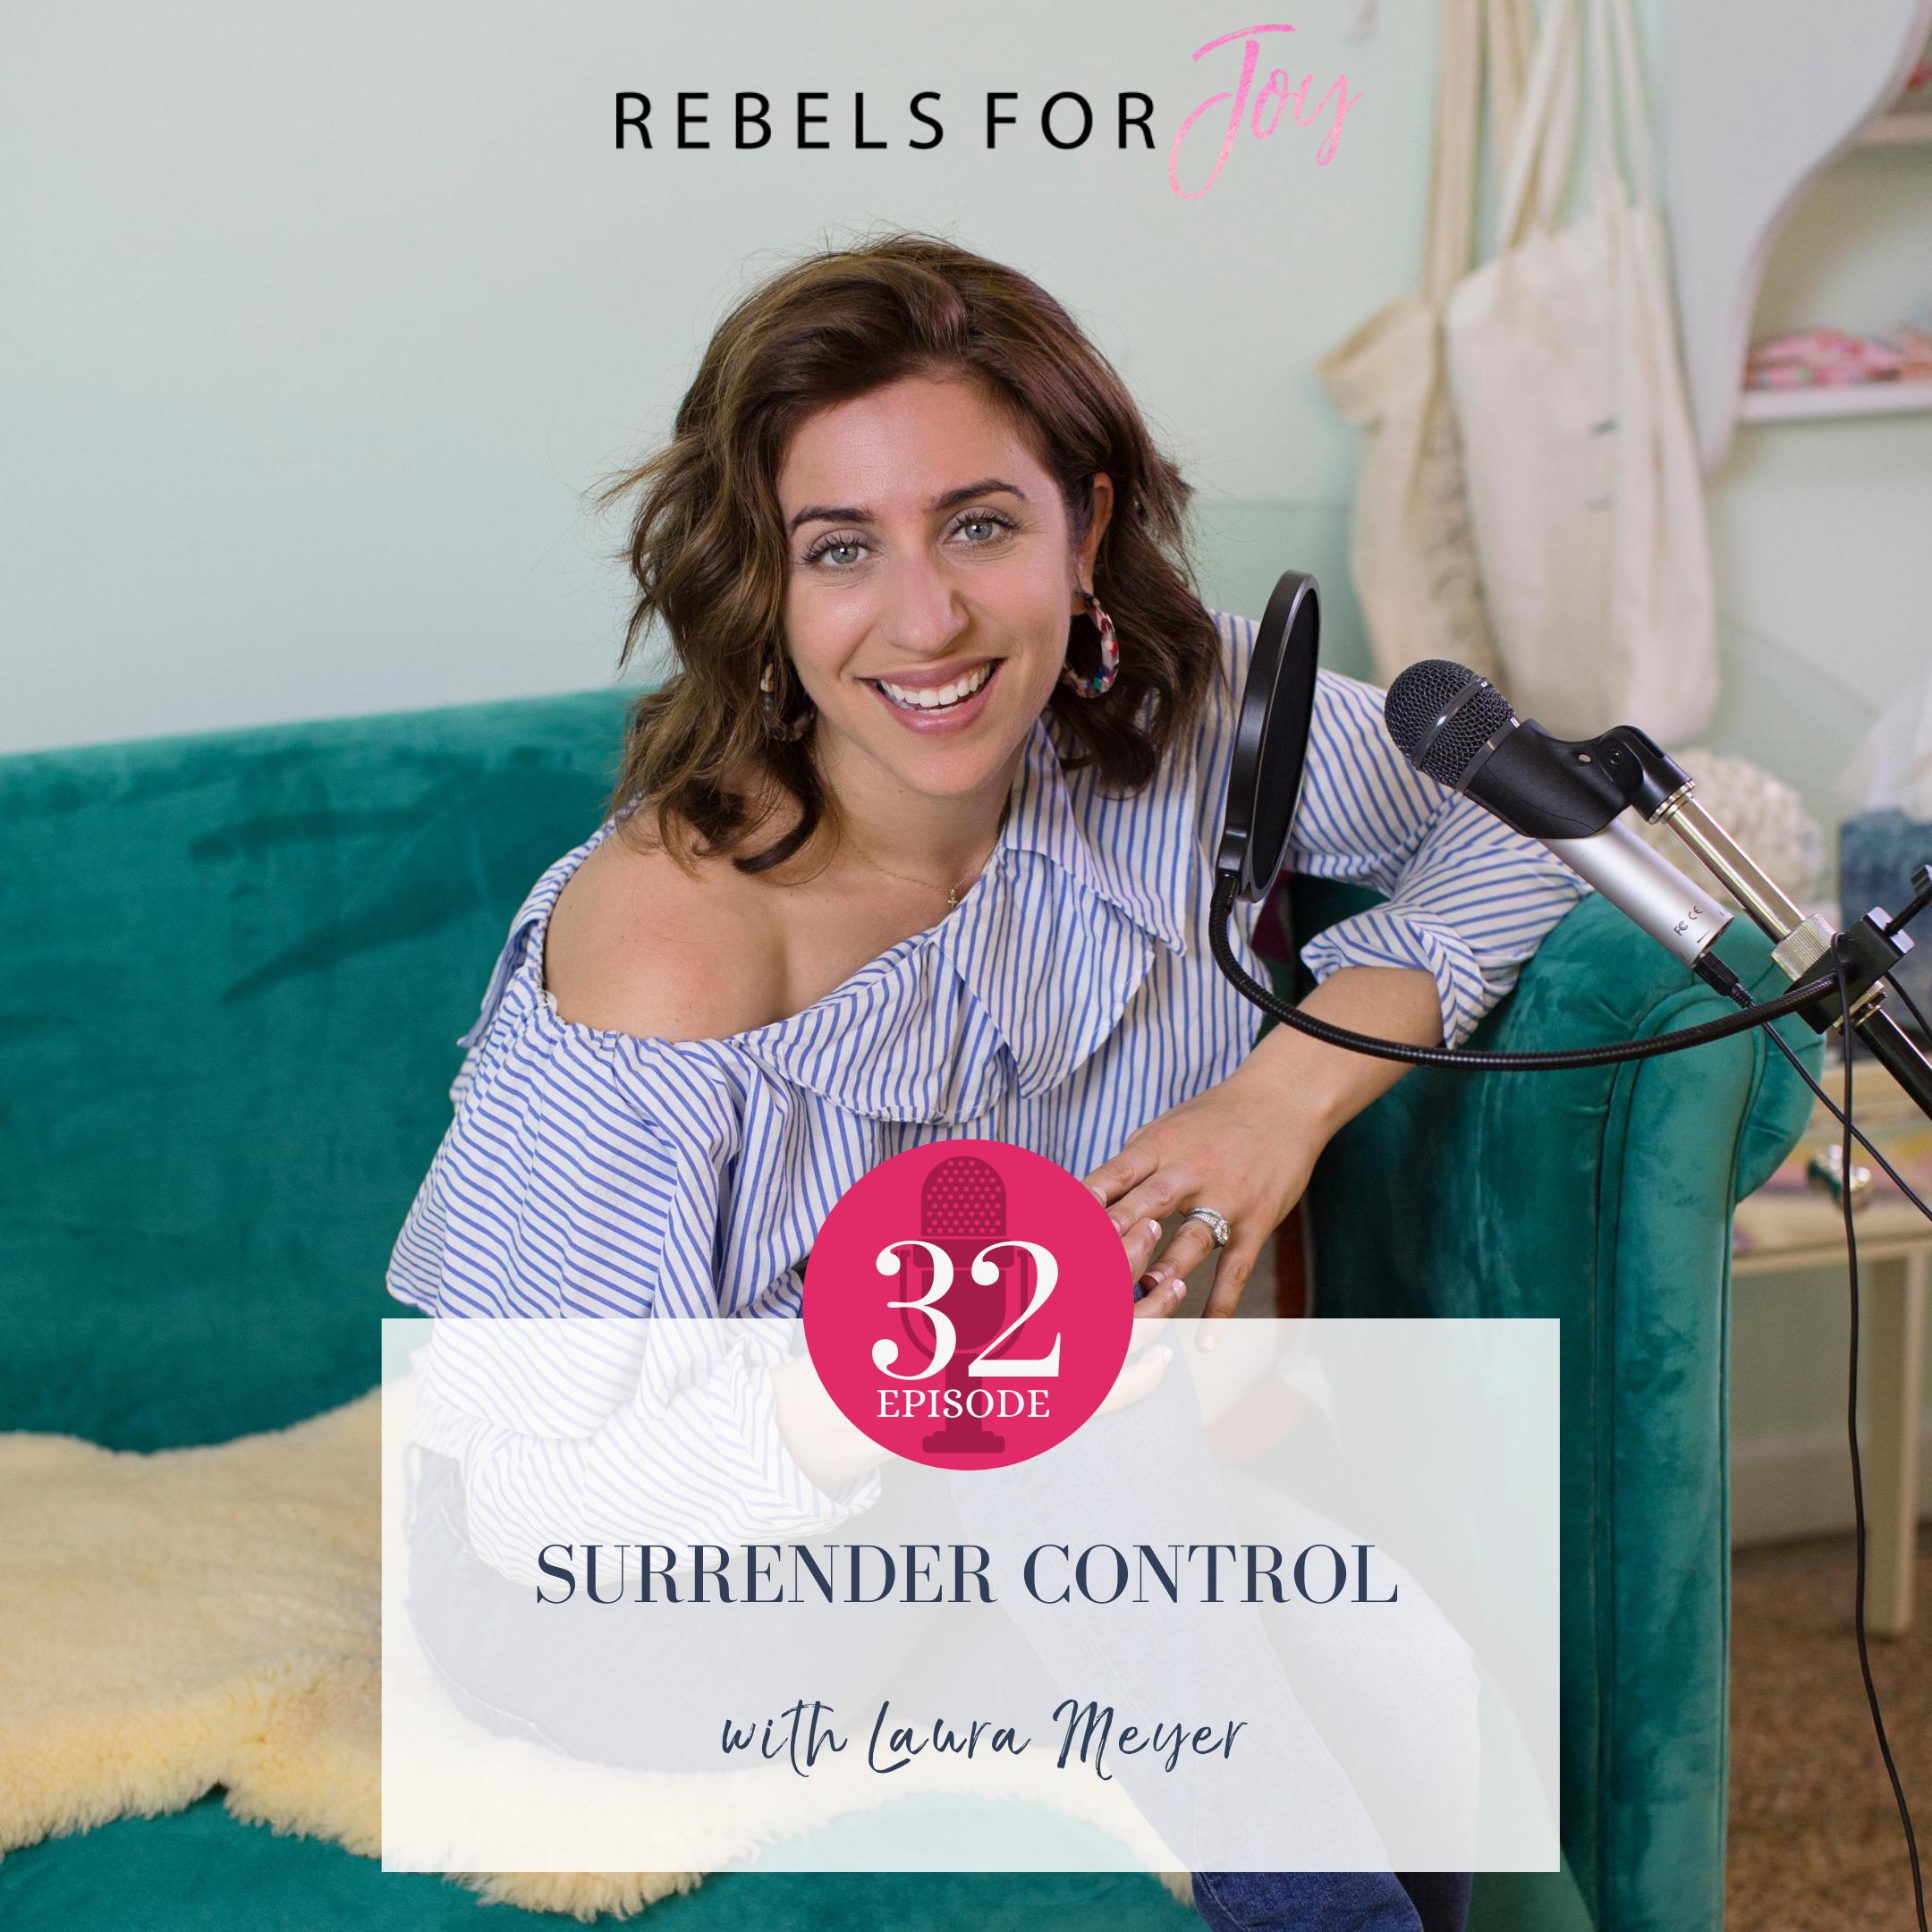 Episode 32: Surrender Control feat. Laura Meyer